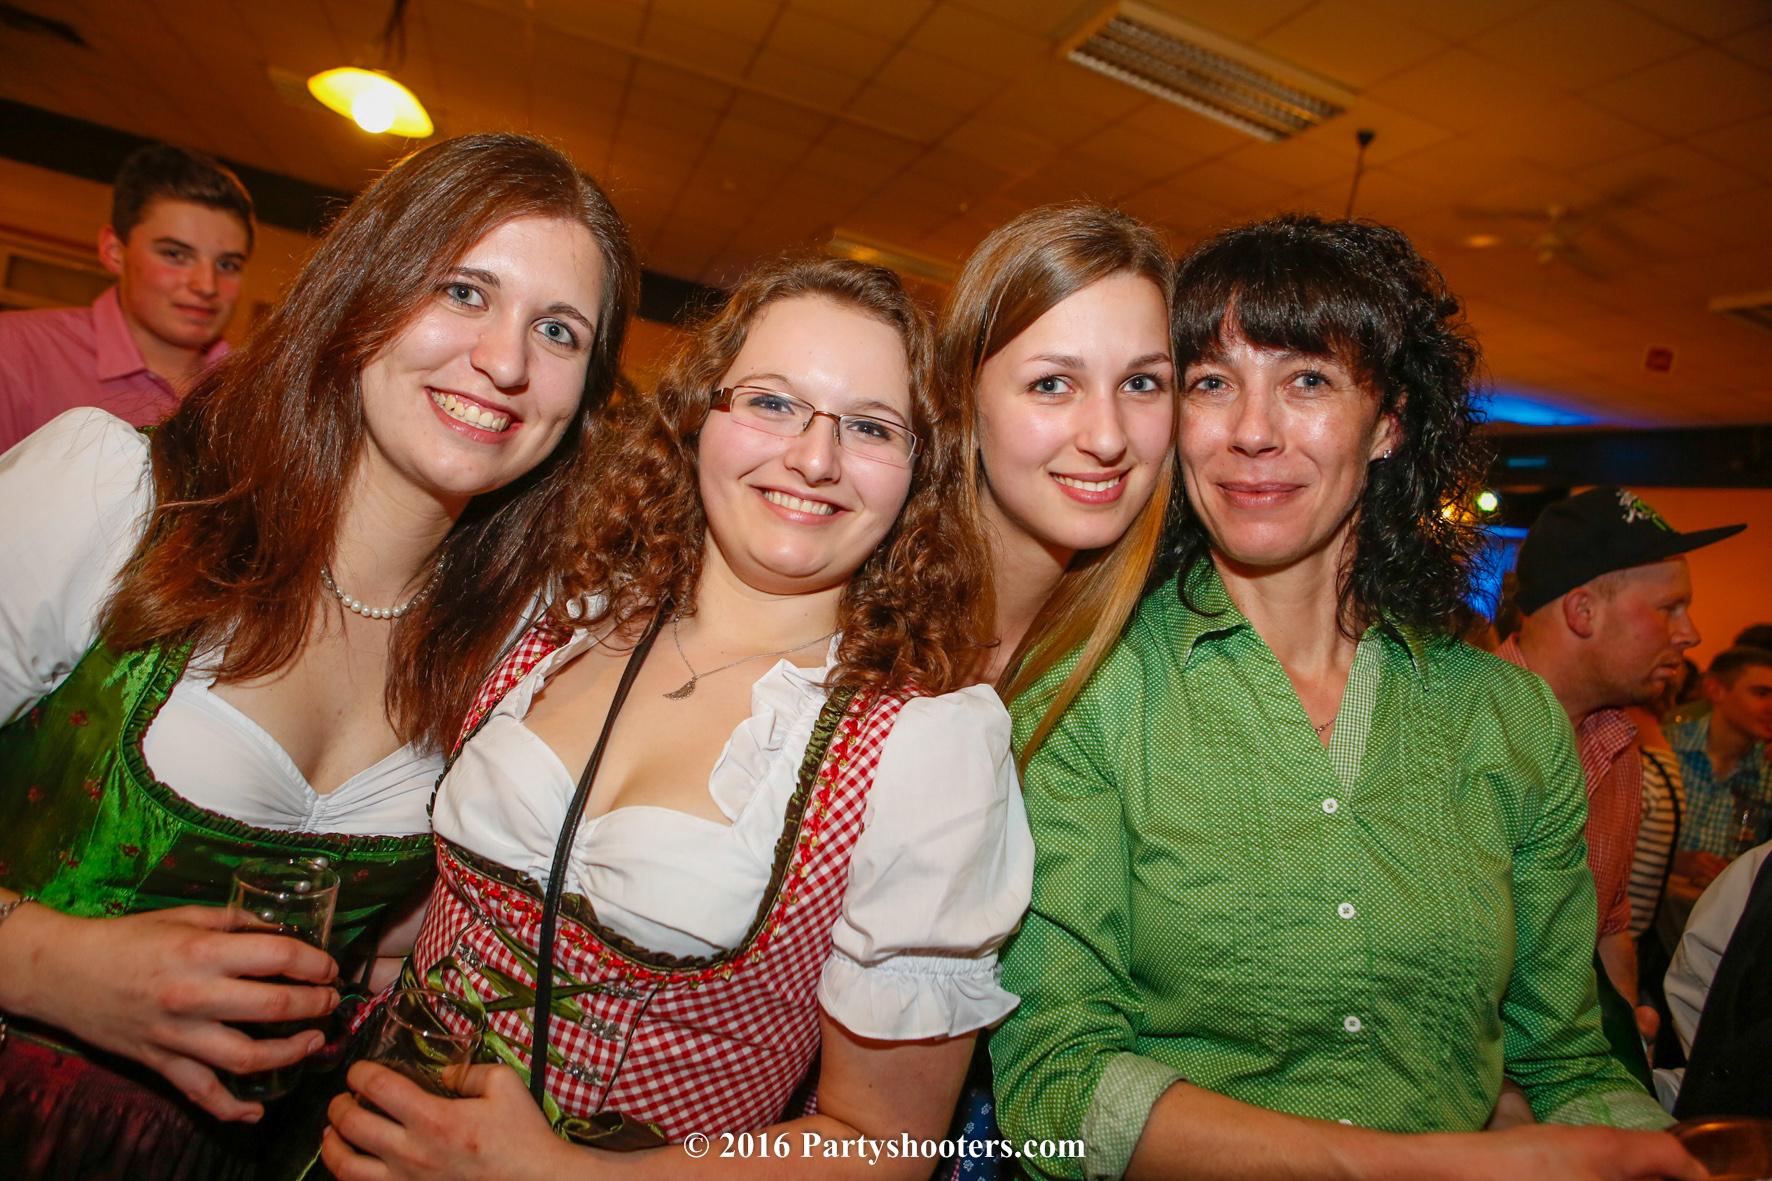 0103 - 4048 - Fruehlingsball Aspach